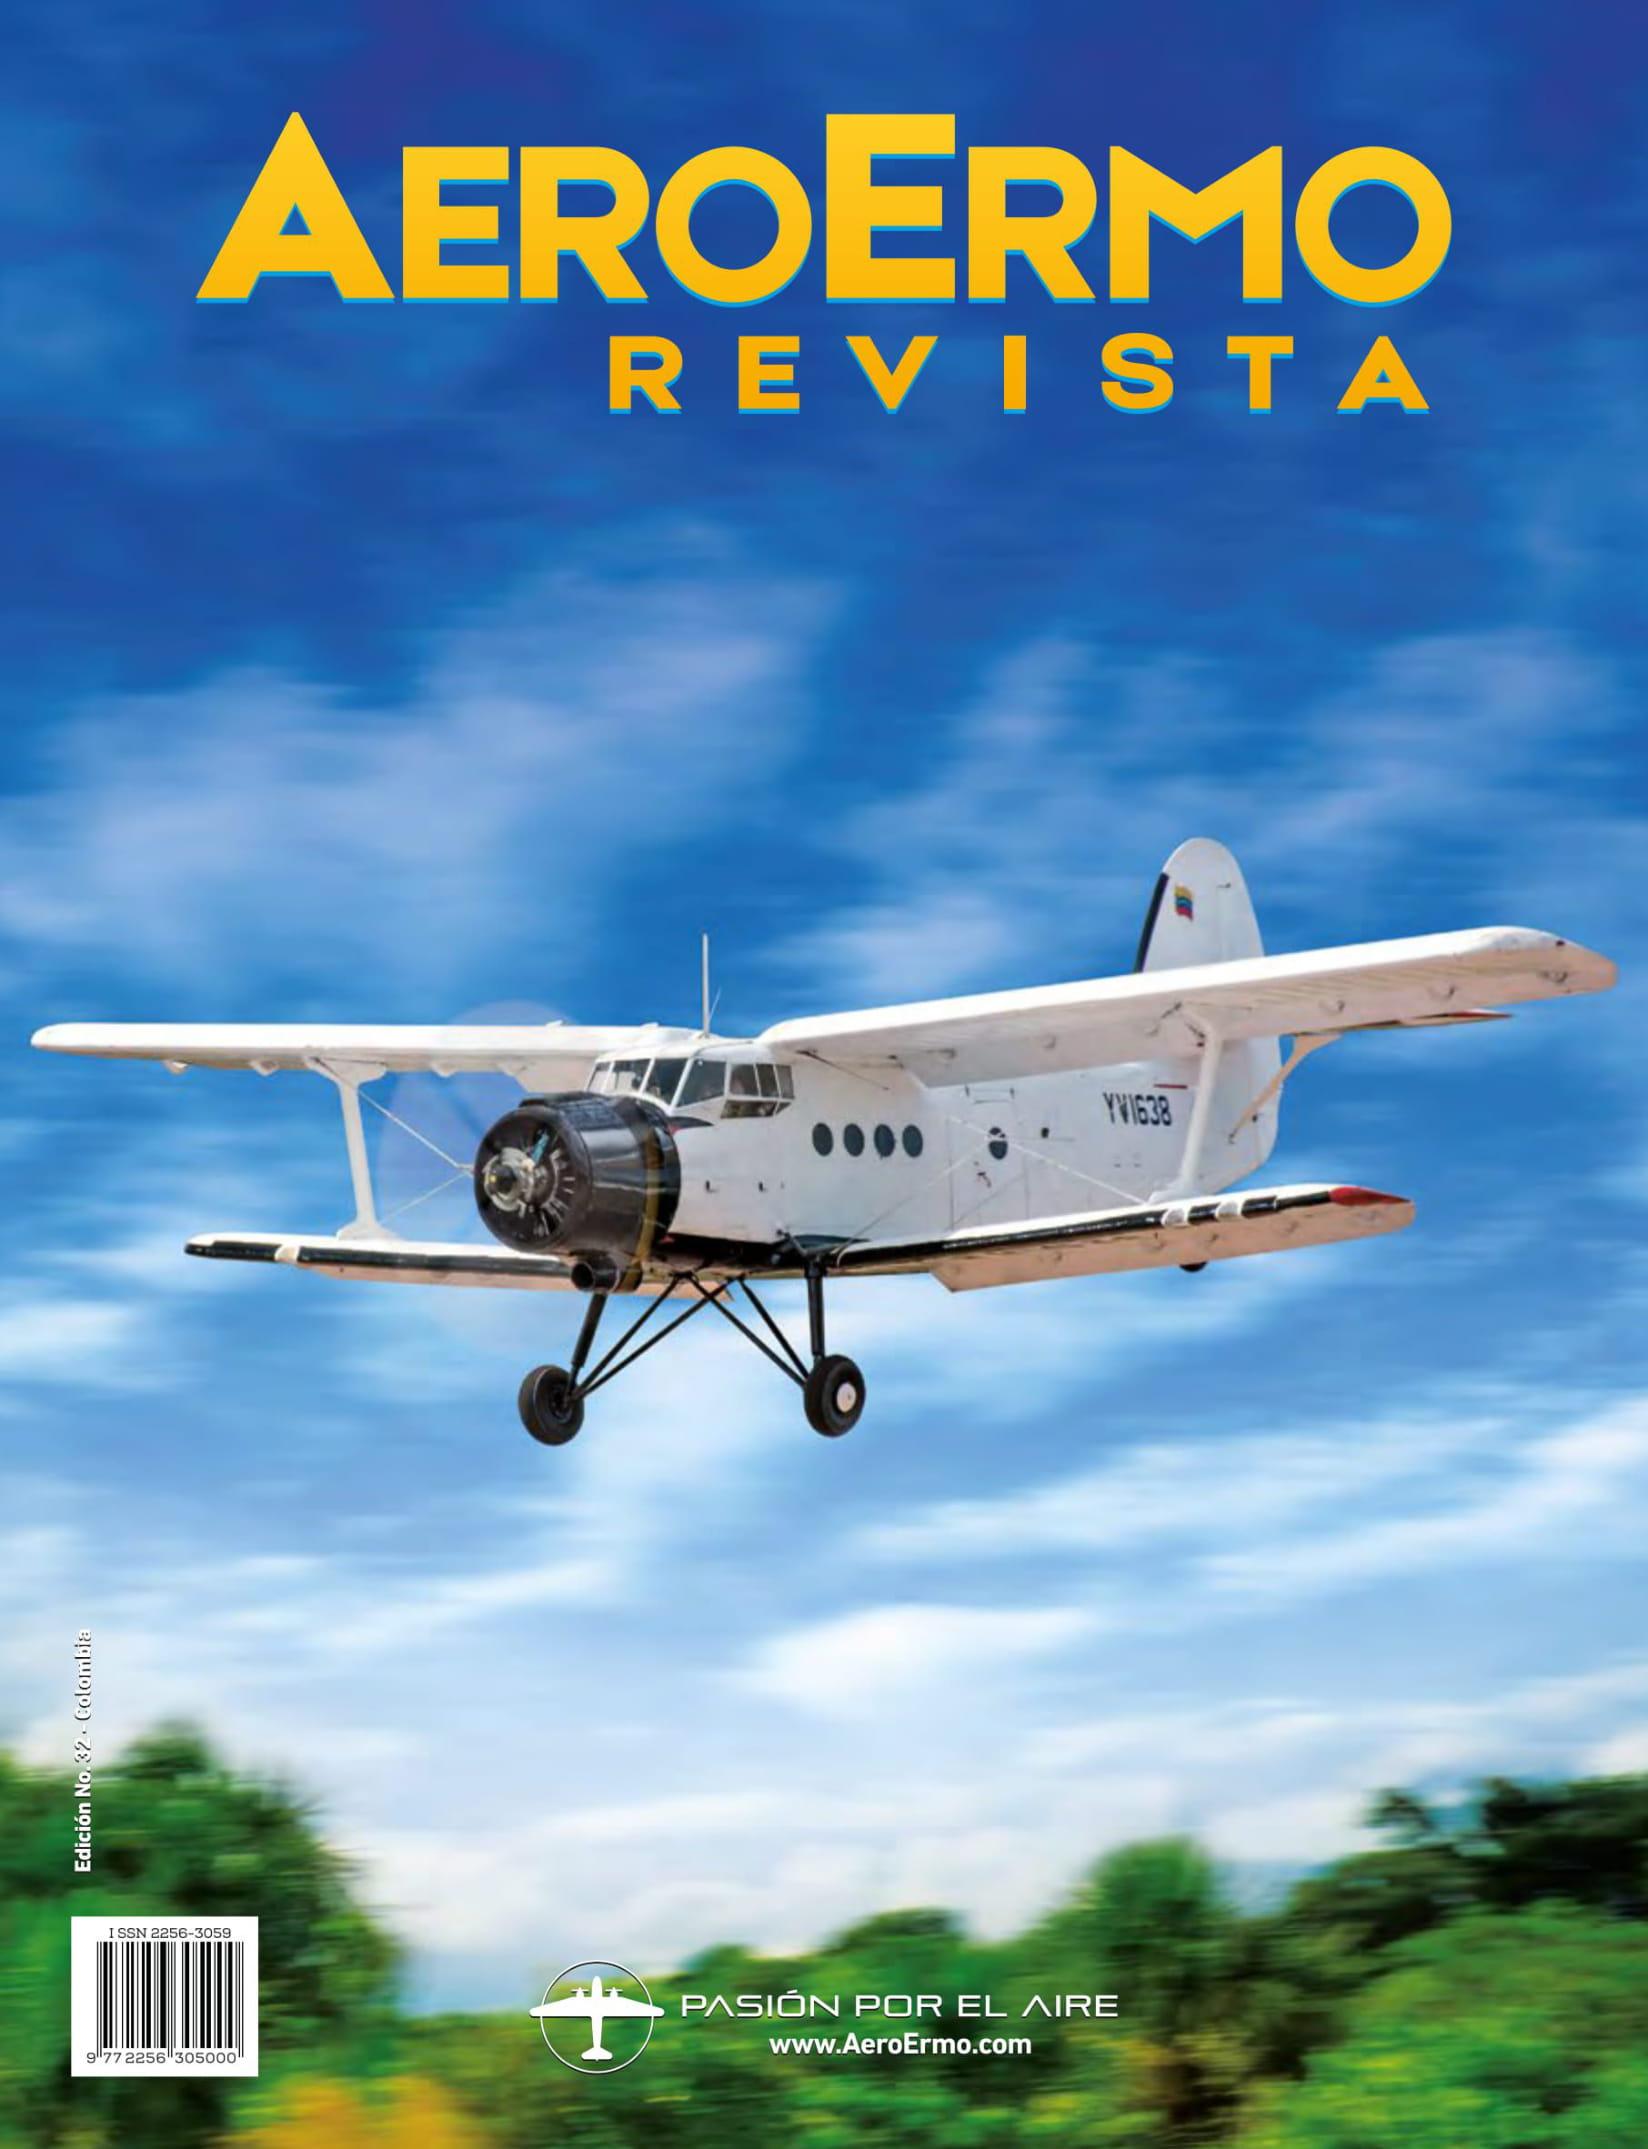 AeroErmo Revista (Colombia)_Dutch NH90s-01